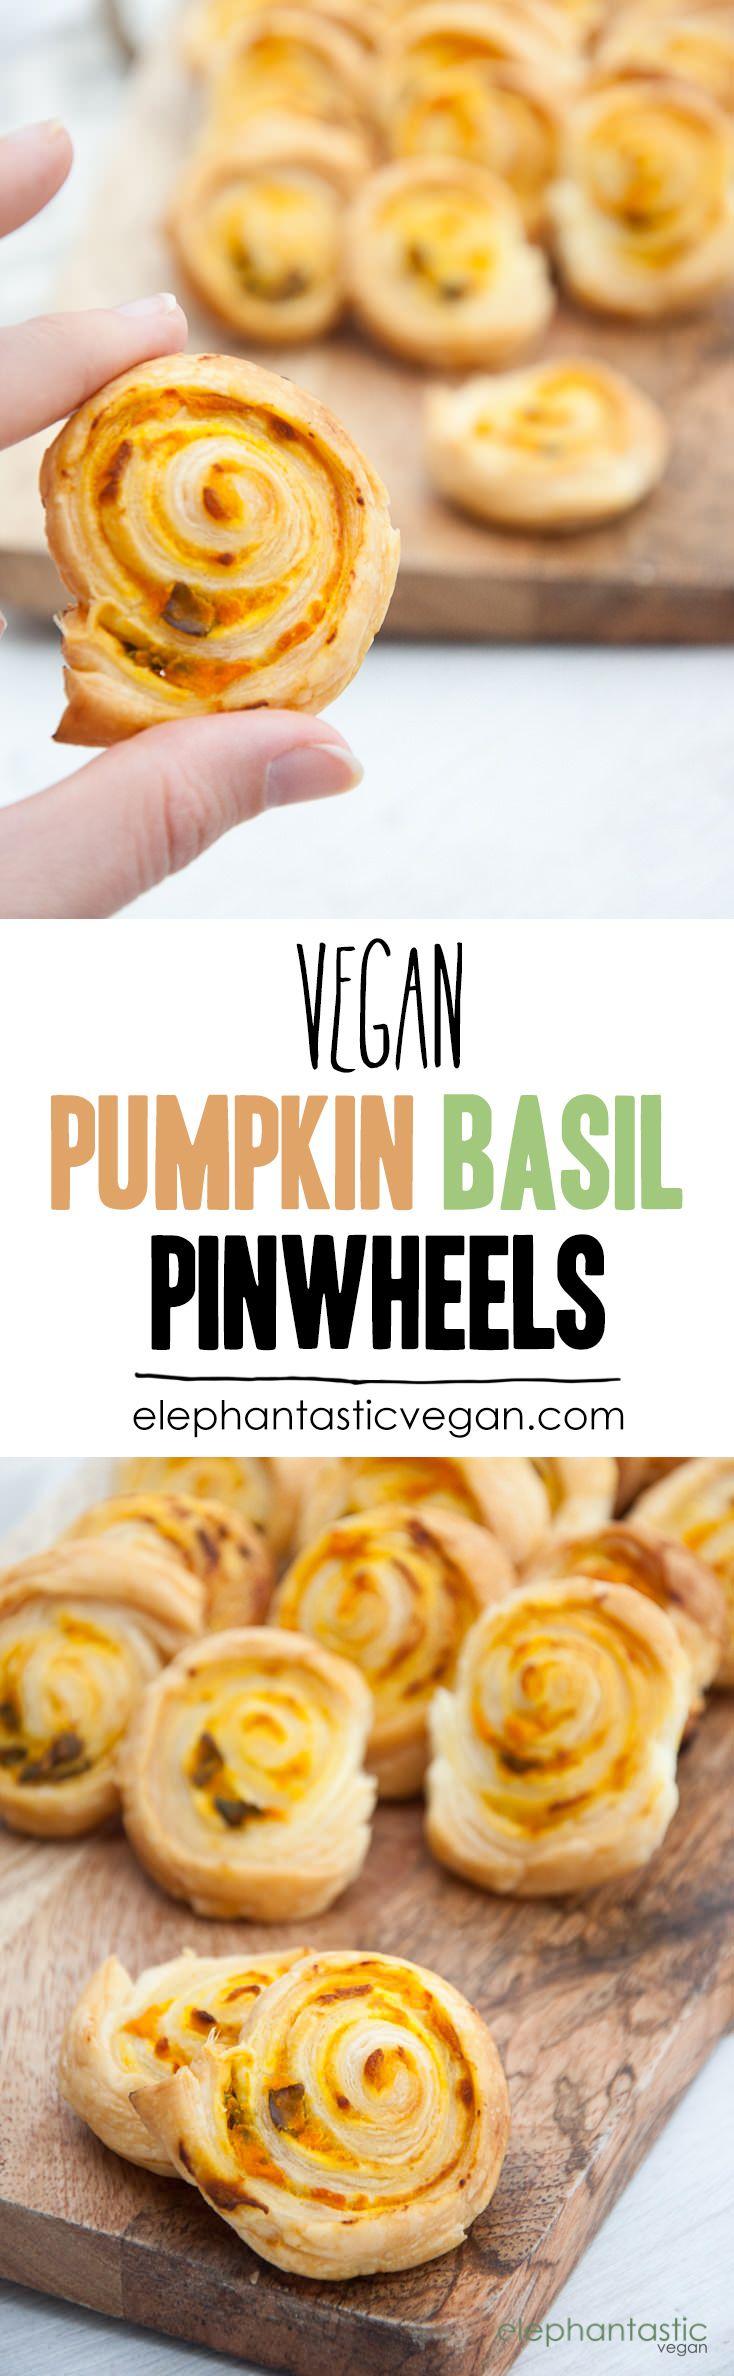 Vegan Pumpkin Basil Pinwheels Pumpkin Basil Pinwheels |